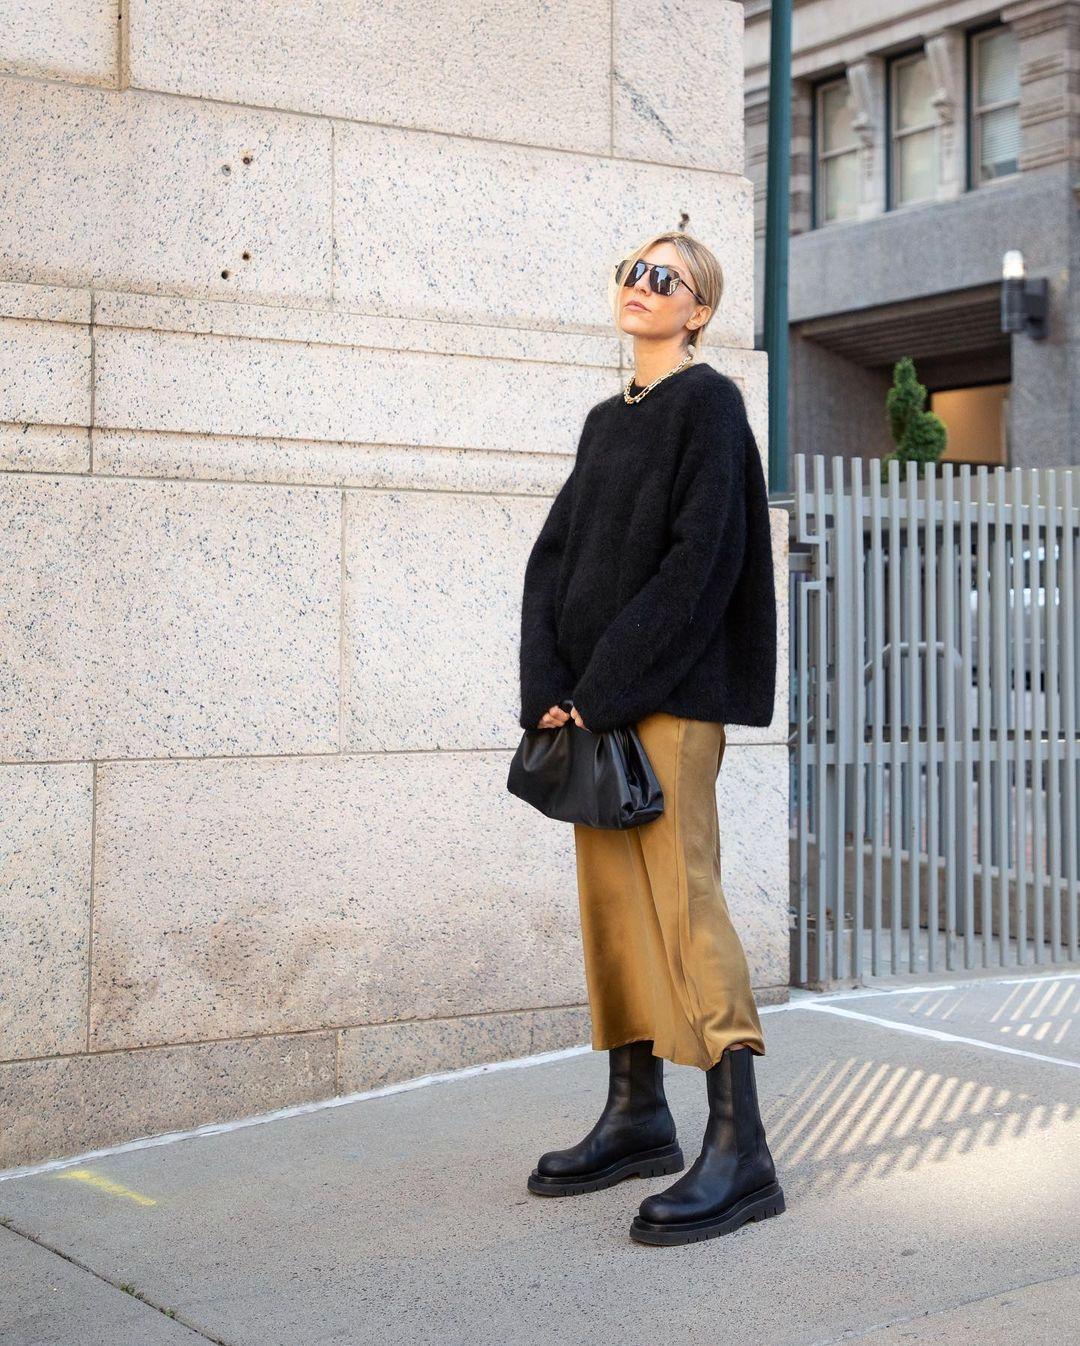 Fall Outfit Idea Stepsofstyle in Oversized Black Sweater, Bottega Veneta Clutch Bag, Camel Silk Midi Skirt, and Black Lug Sole Boots